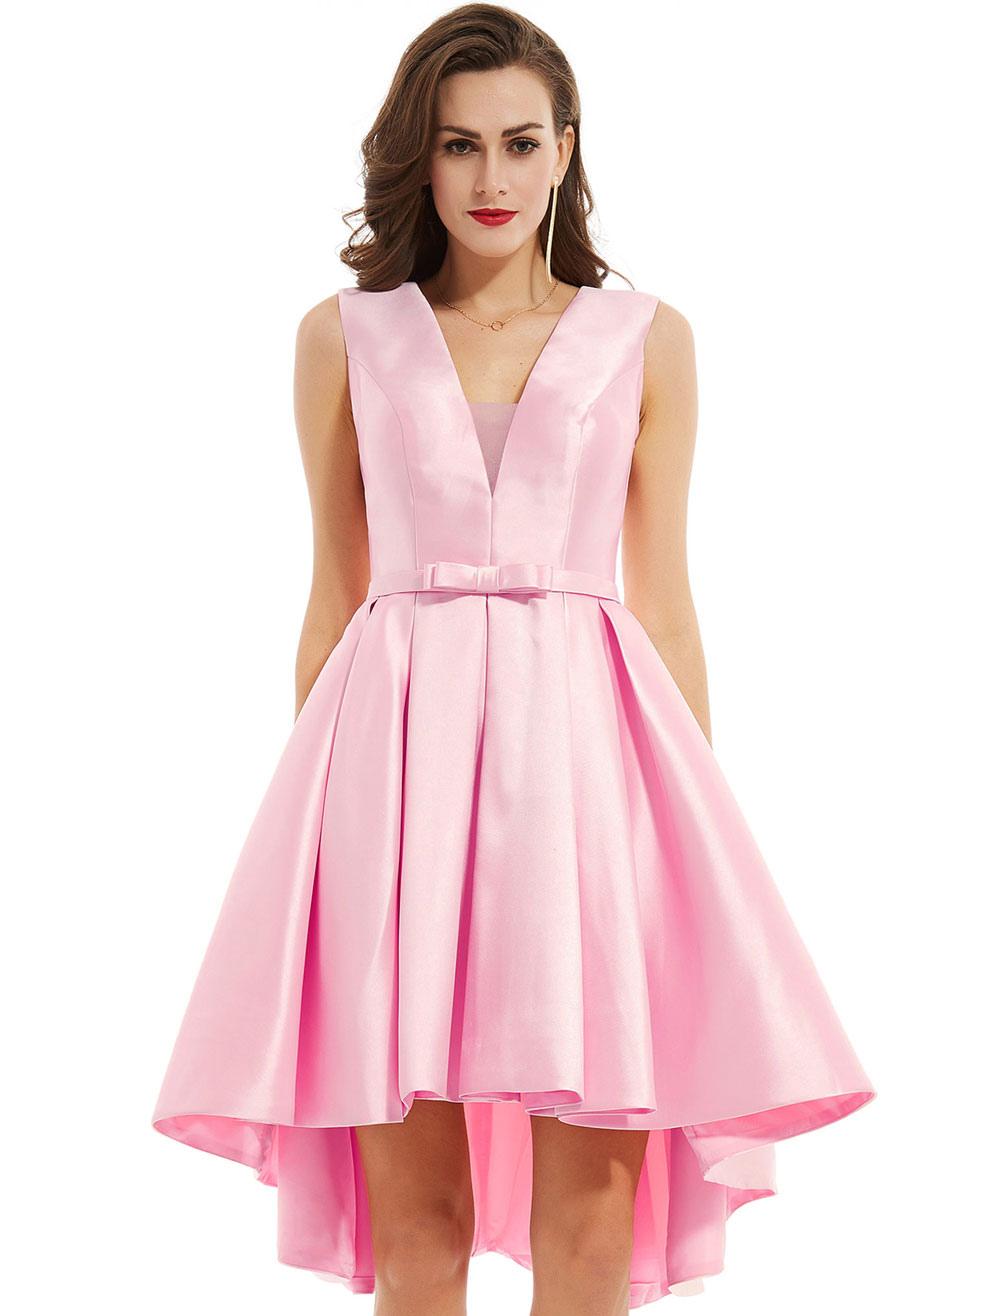 Vestido de Cóctel Suave Rosa V Cuello Alto Bajo Asimétrico Arco Faja ...